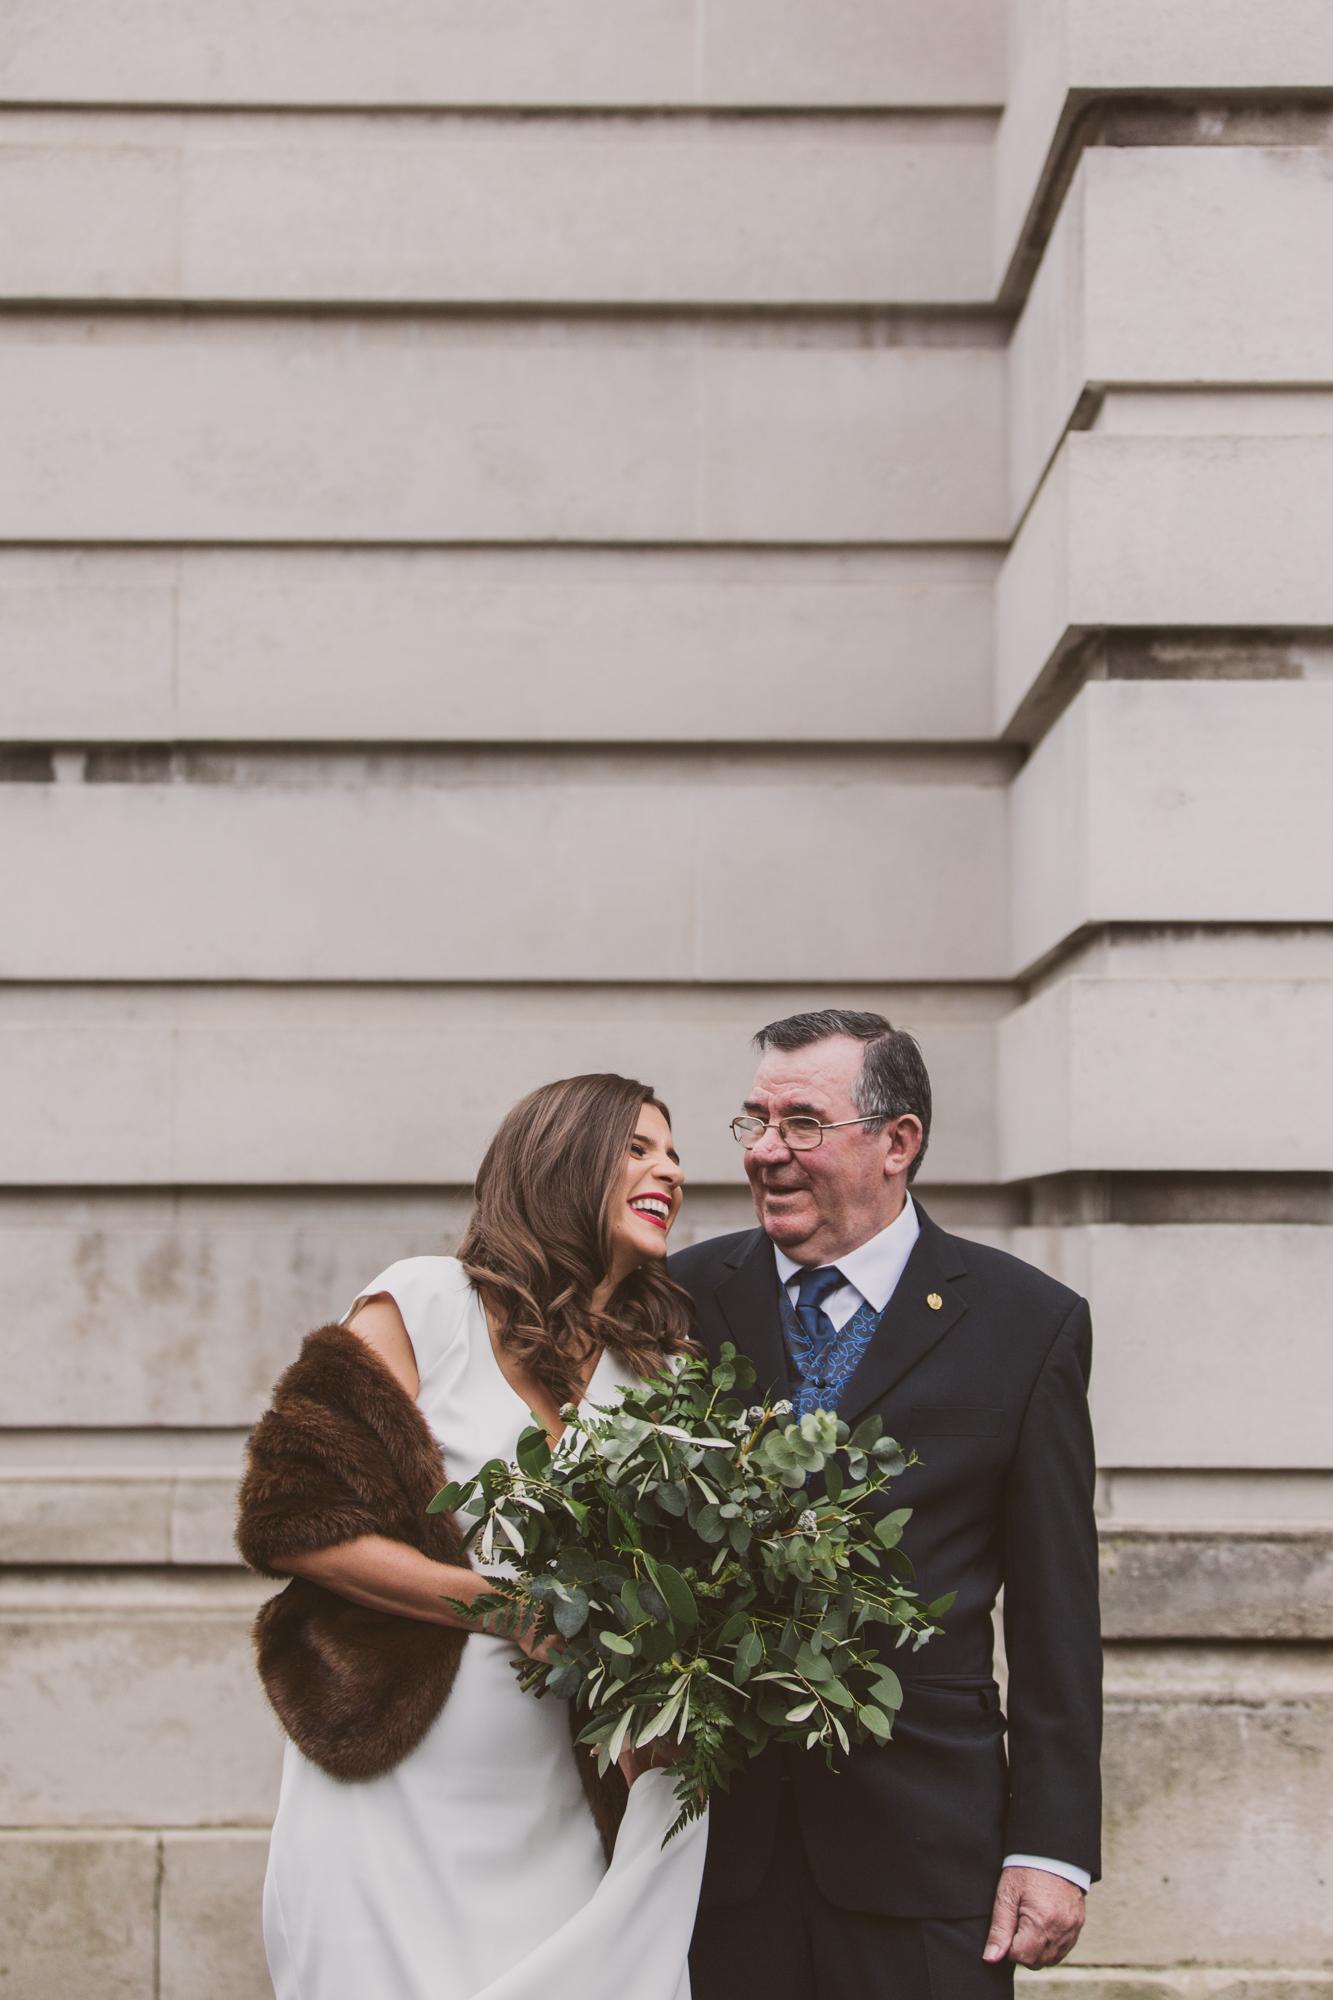 City_Centre_northern_ireland_wedding_inspire_weddings_12.jpg